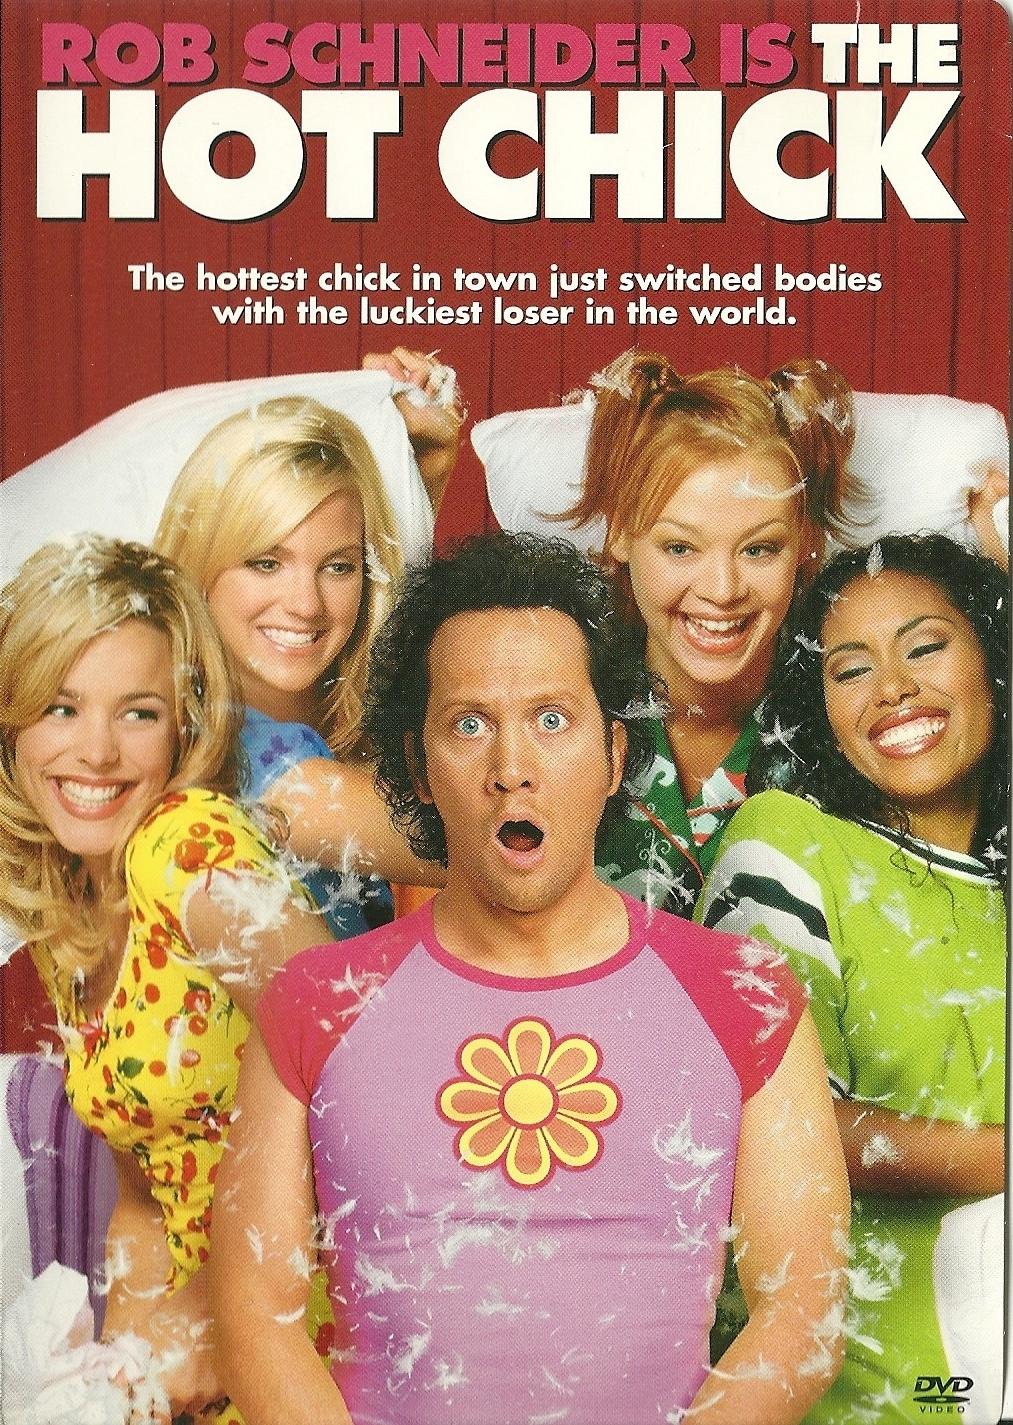 Hot chick dvd rob schneider anna faris   b  1